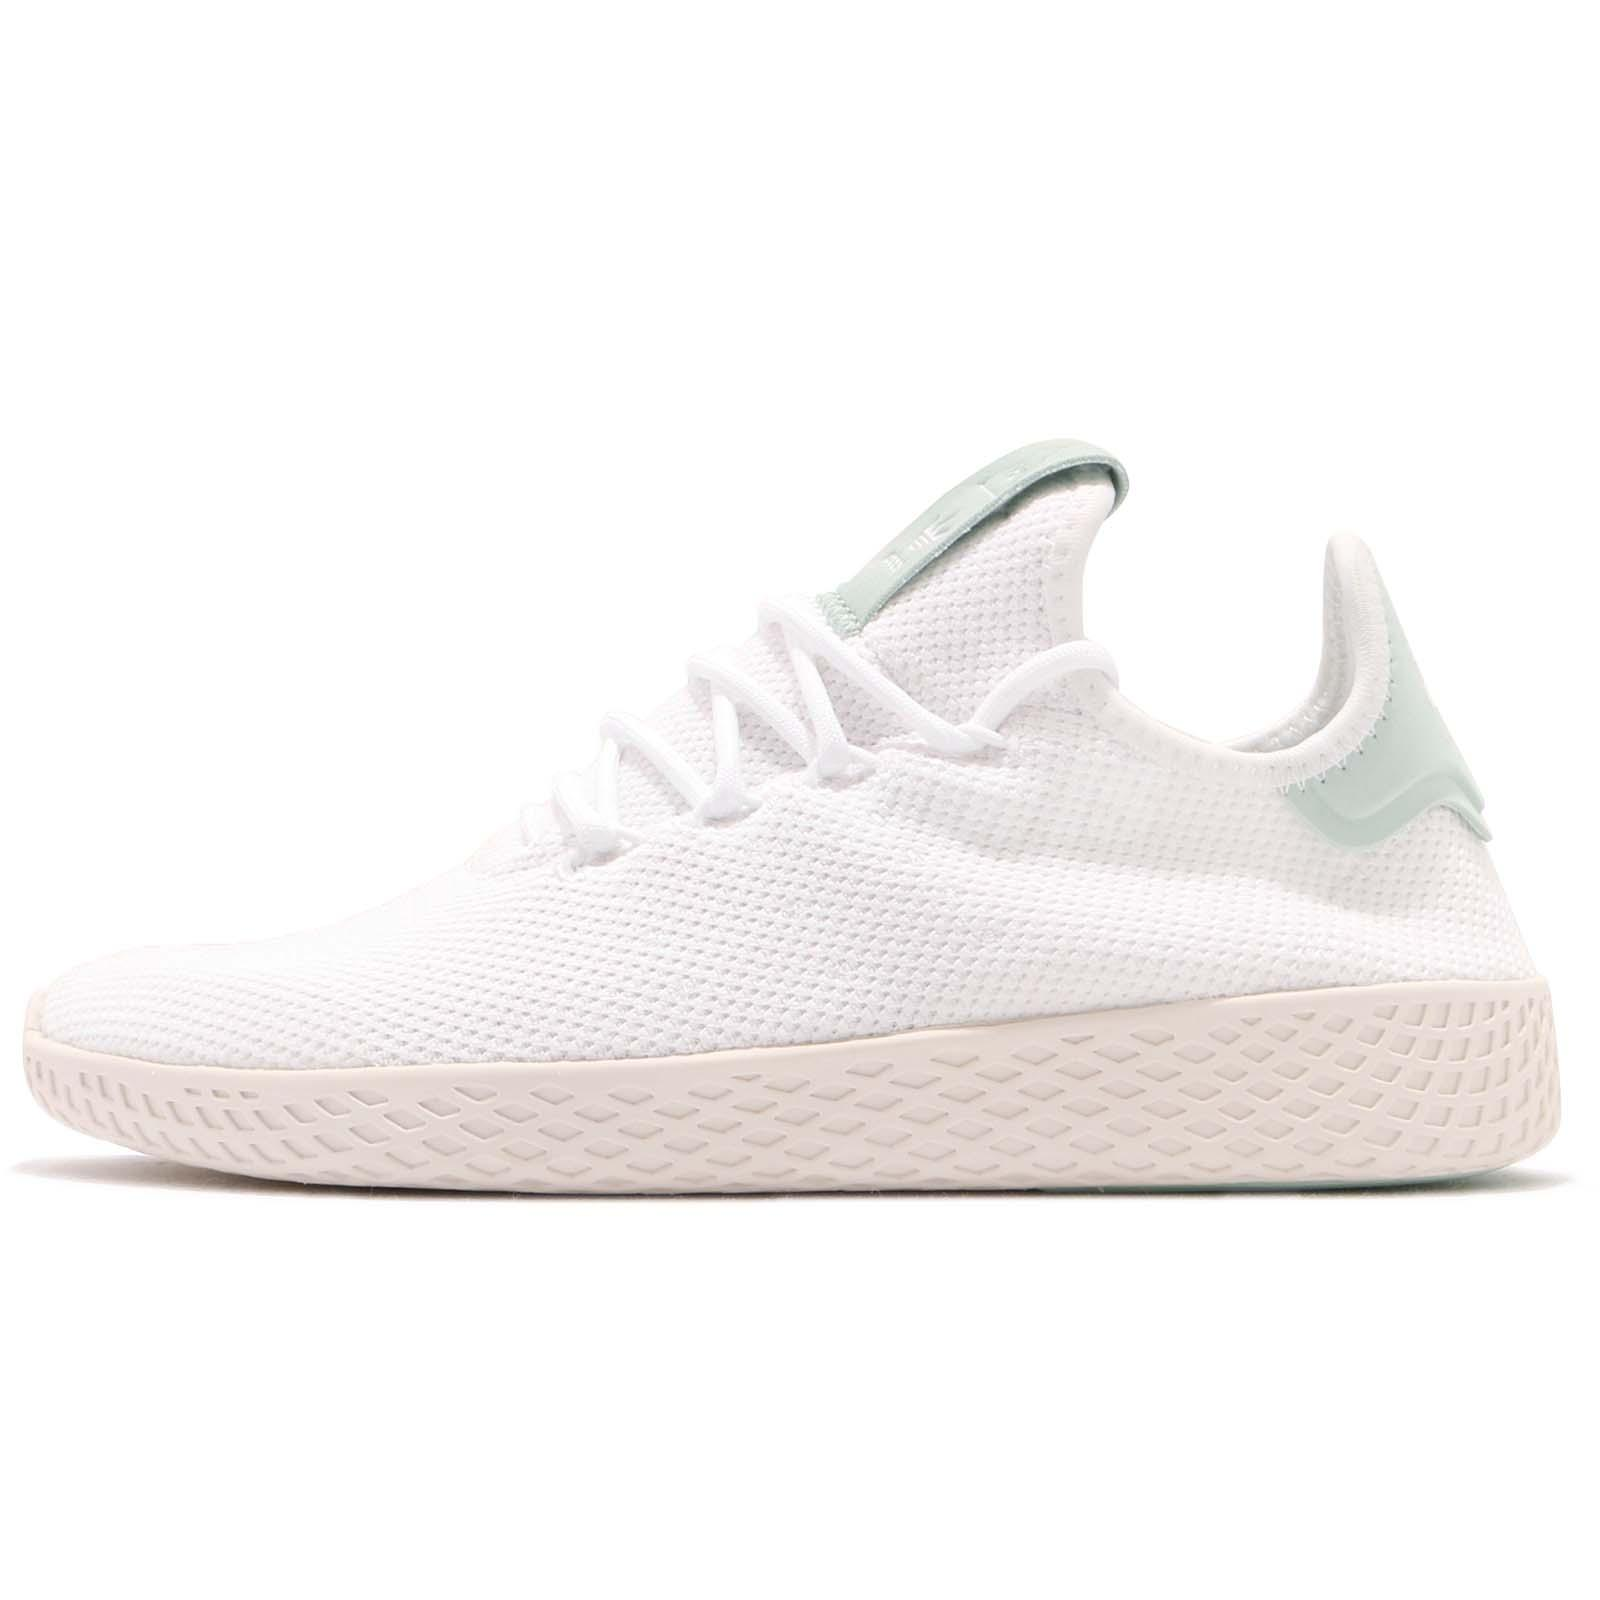 96453efd306f3 adidas Originals PW Tennis Hu Pharrell Williams White Green Men Shoes CQ2168